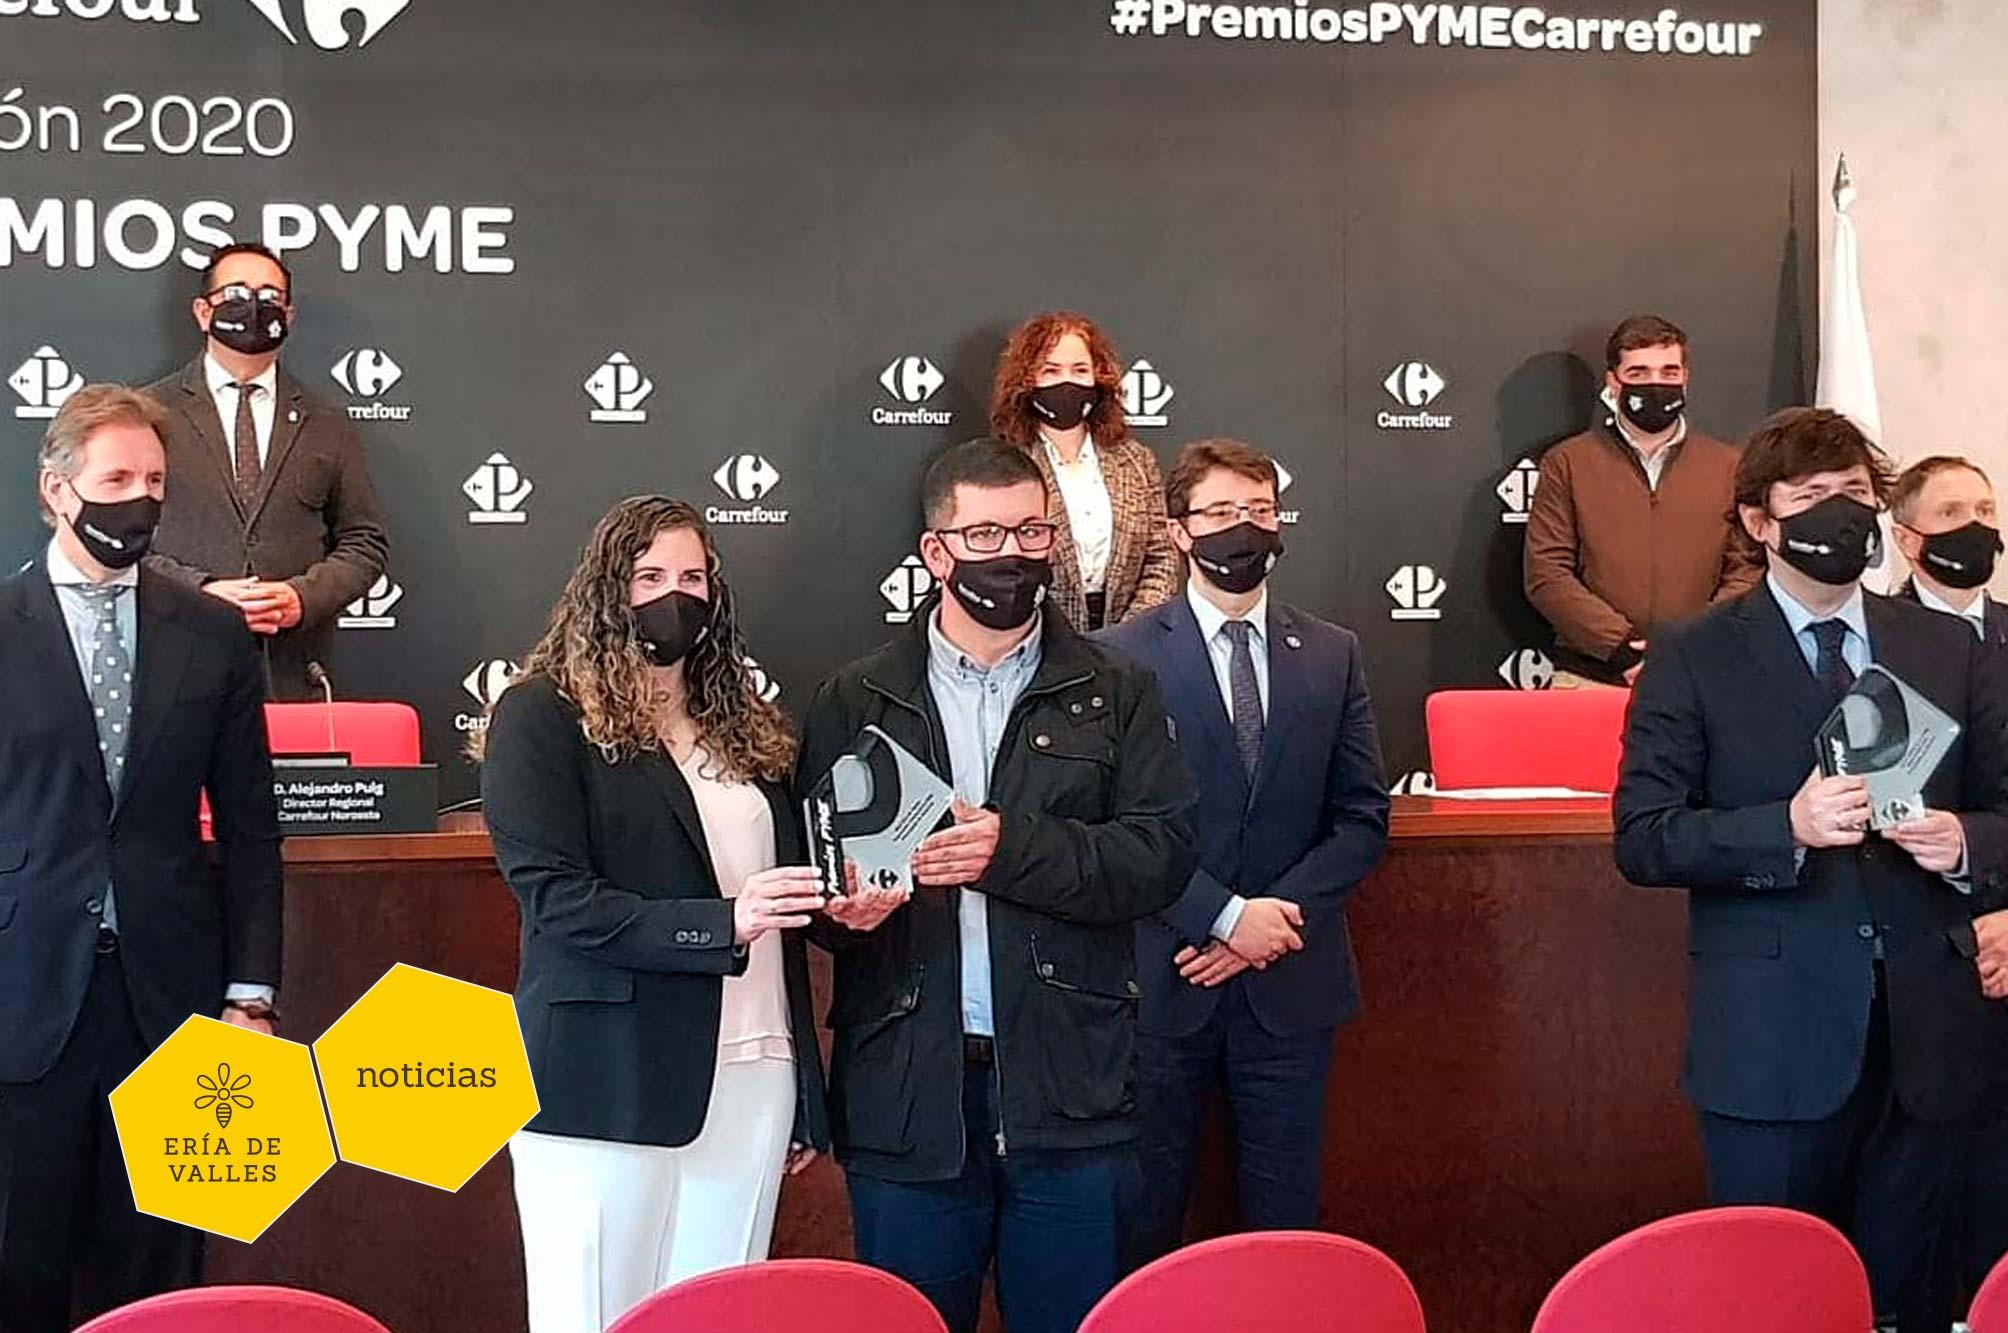 Premios Pyme Carrefour Transición Alimentaria